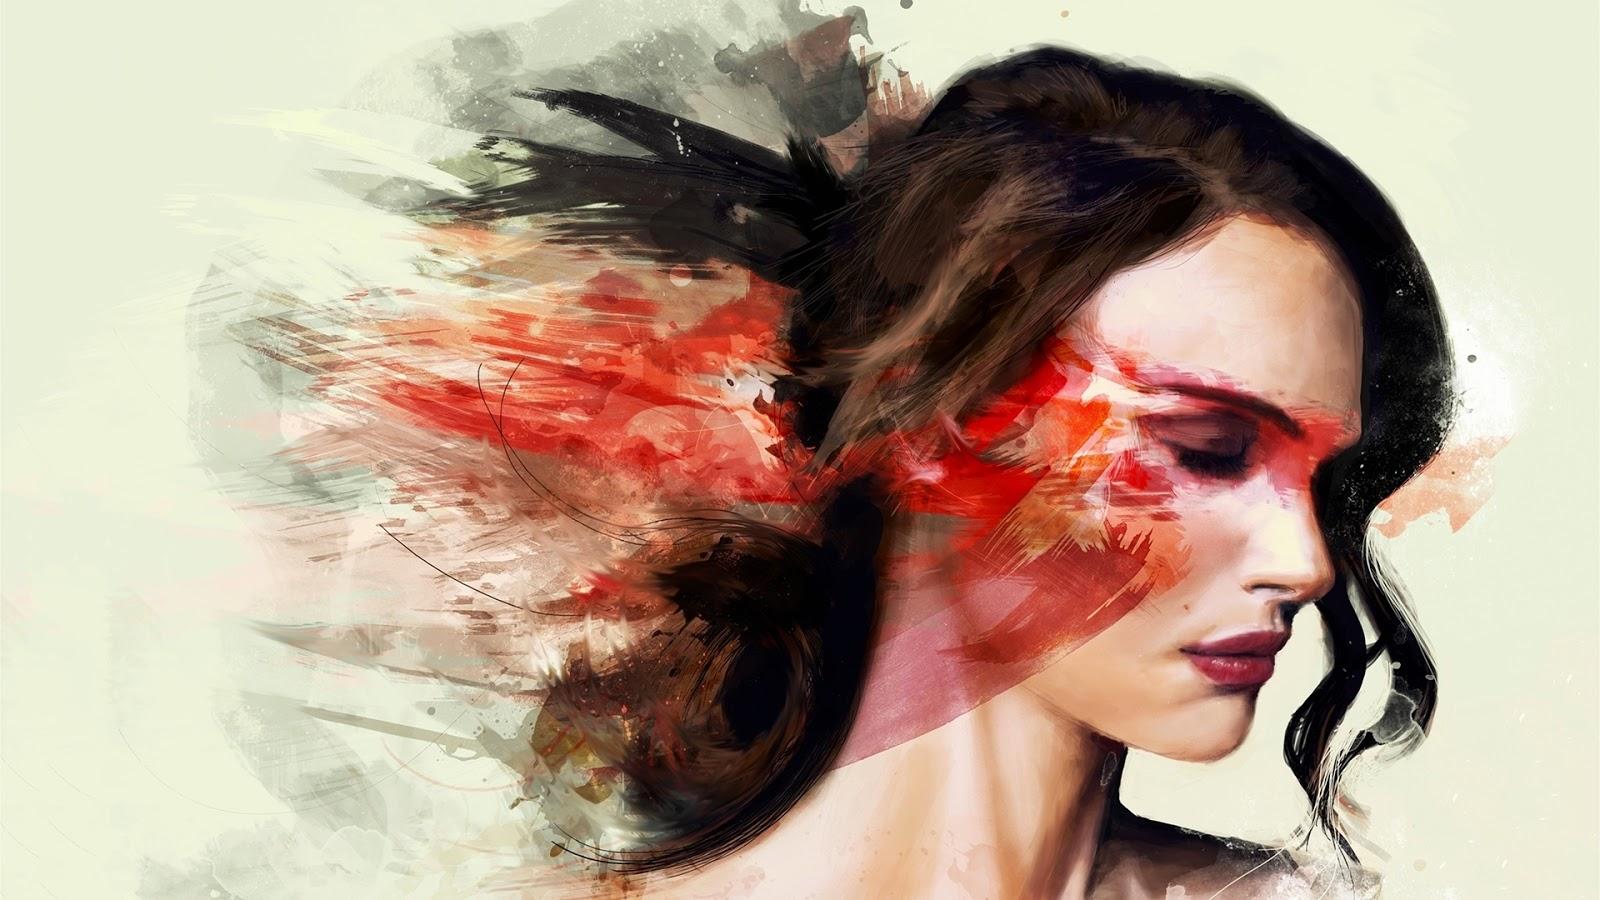 Natalie Portman Full HD Wallpaper